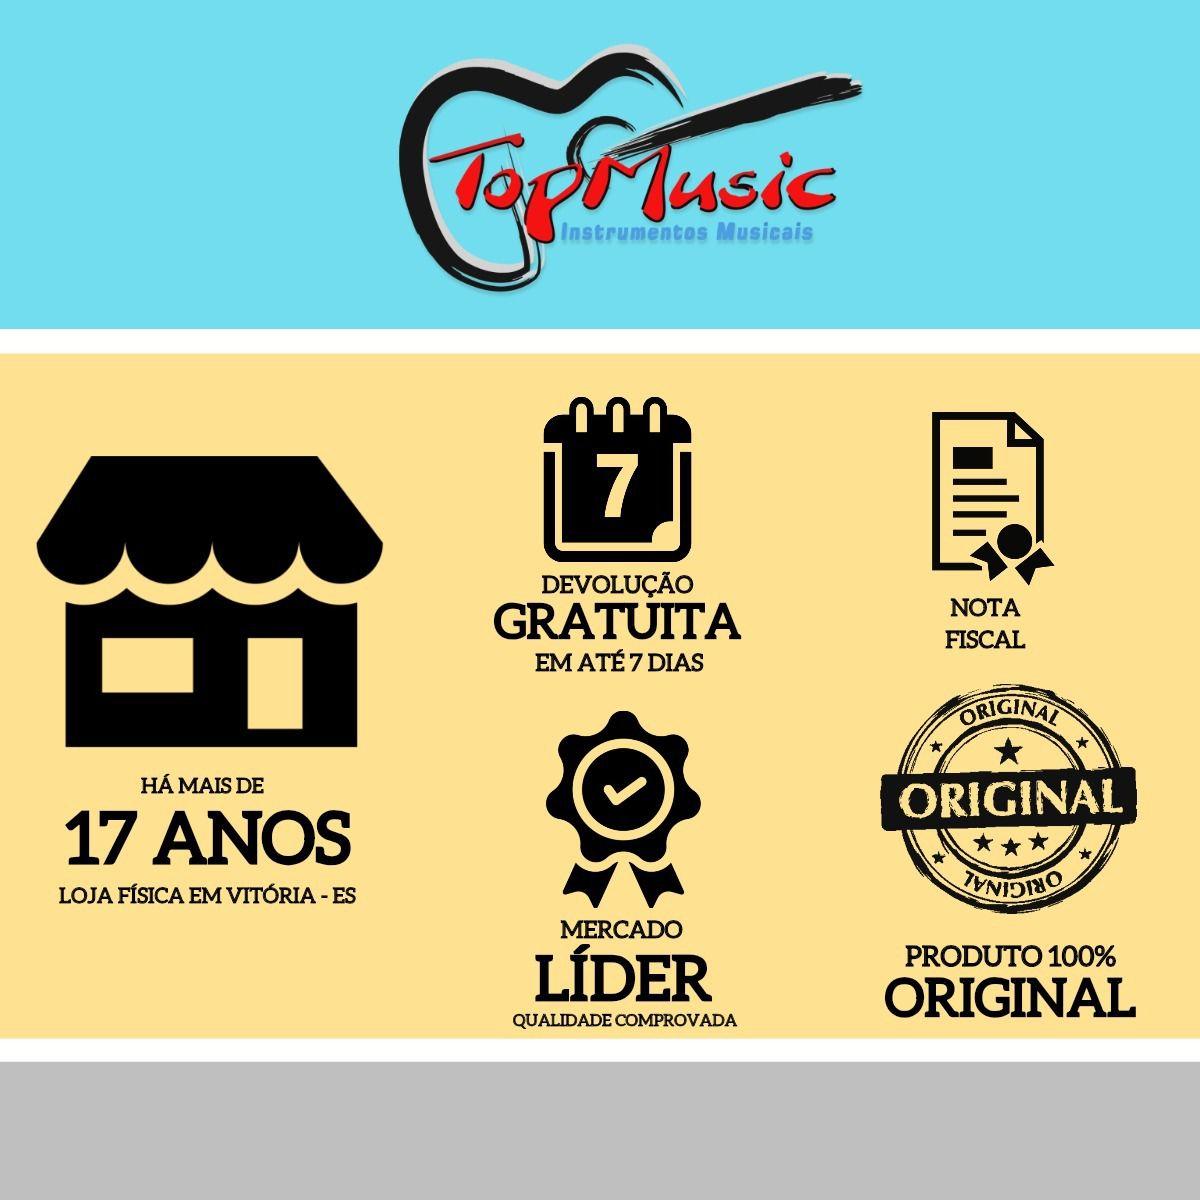 Violino Vivace Mozart Mo44 4/4 + Estojo Arco Breu